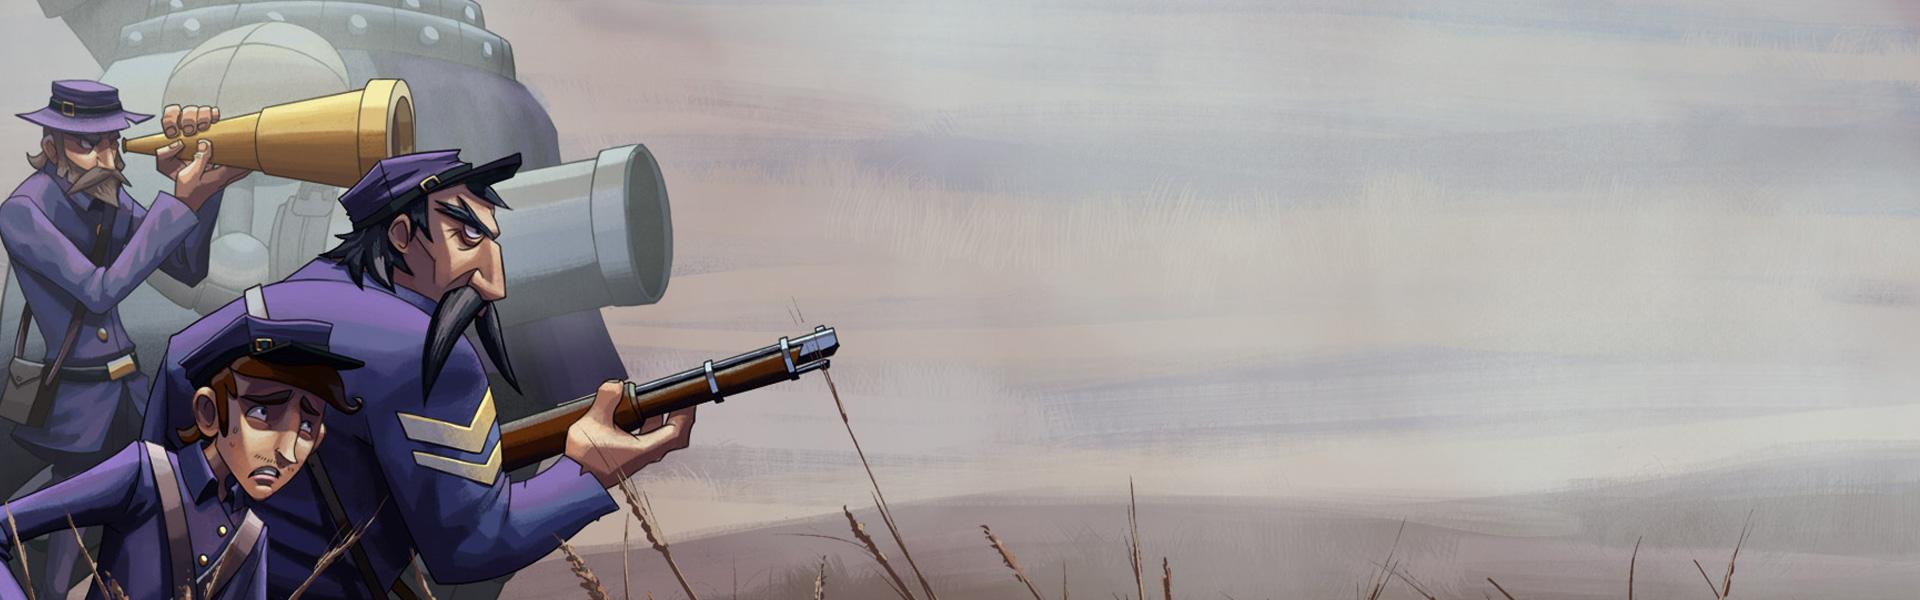 Iron-Tactics-hero